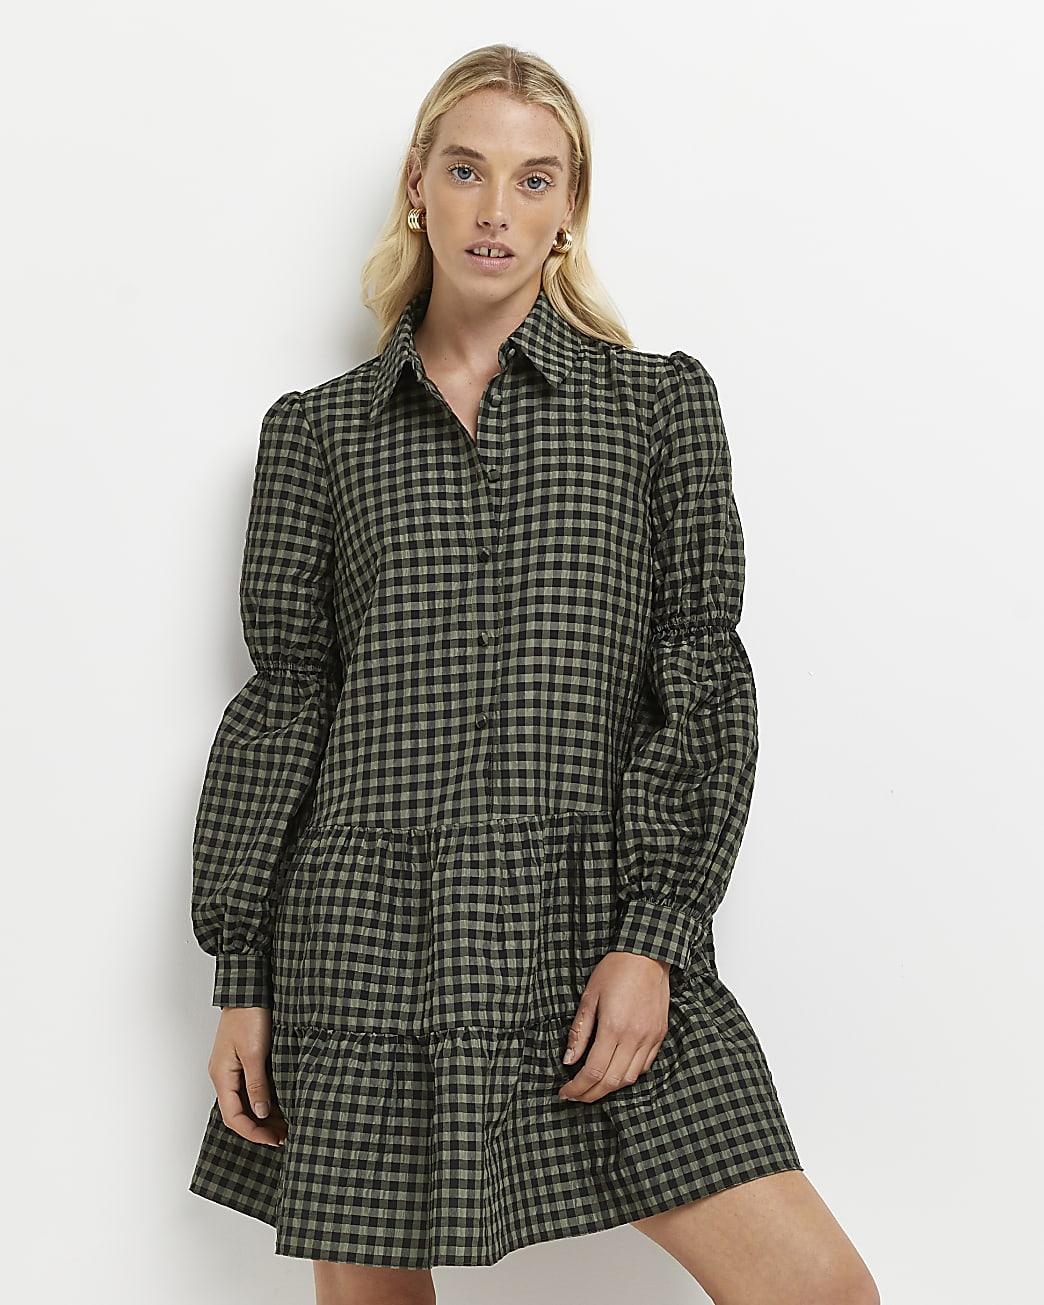 Green gingham tiered mini dress